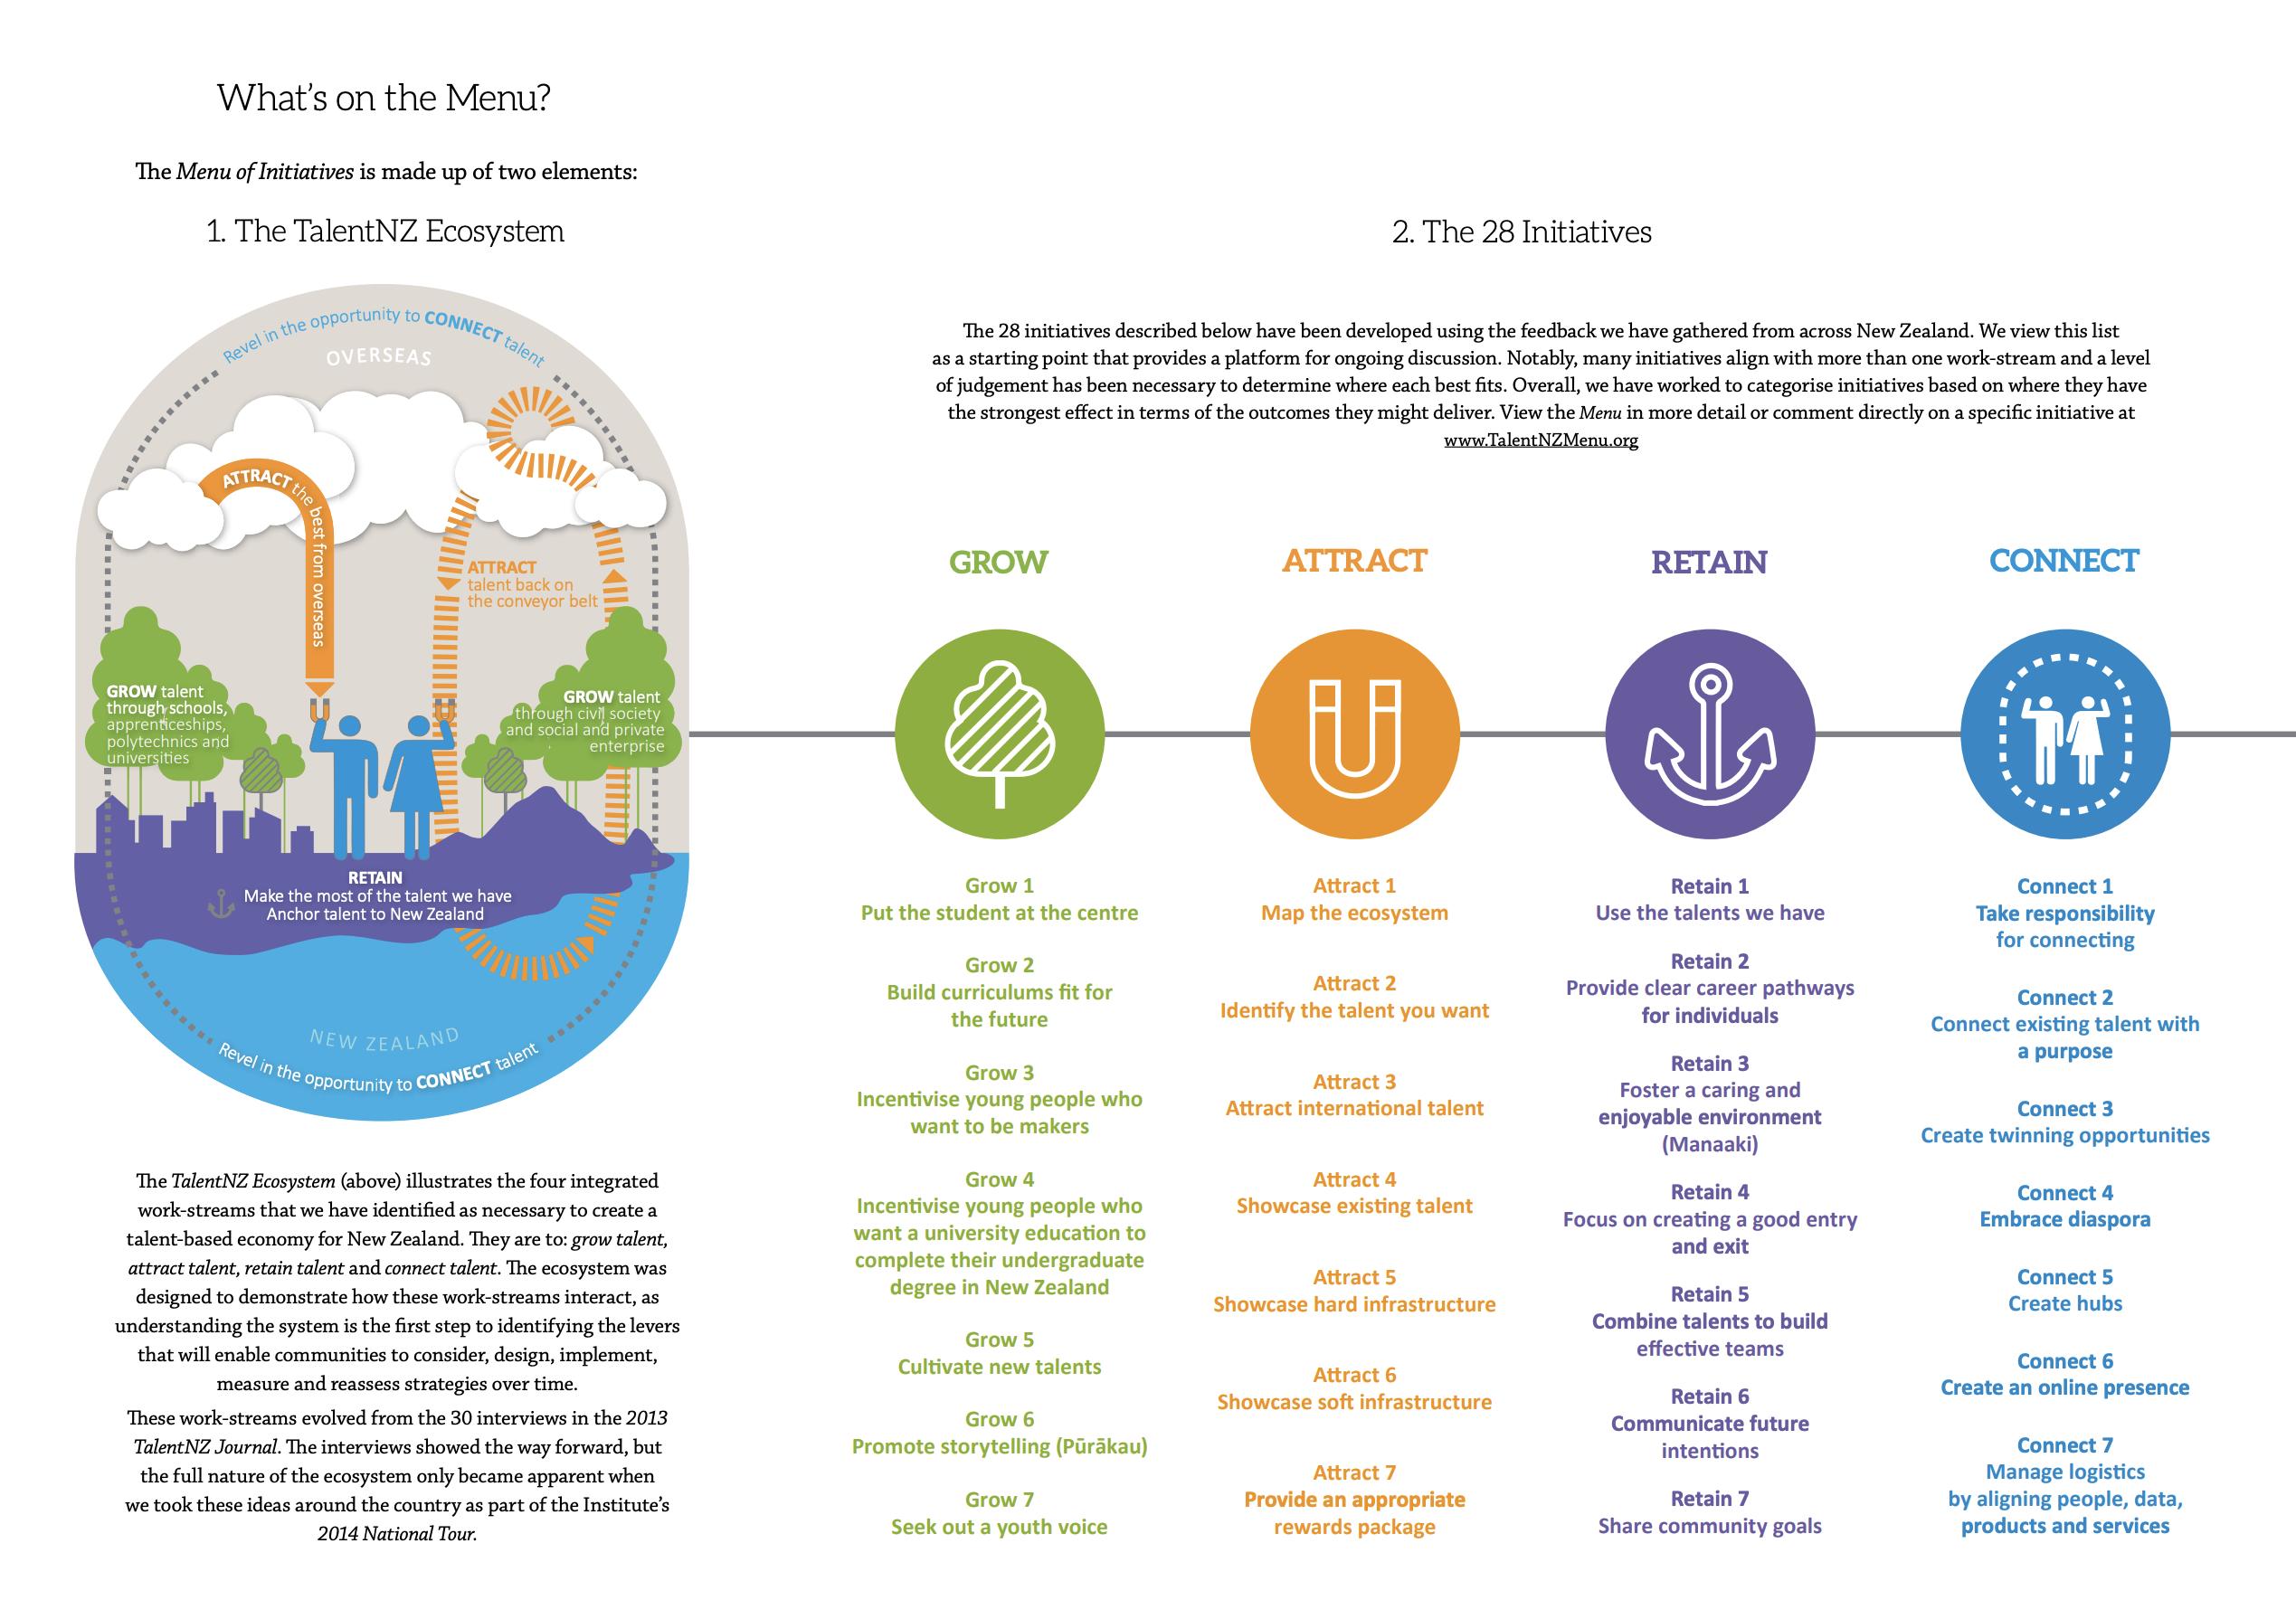 TalentNZ Menu of Initiatives Infographic